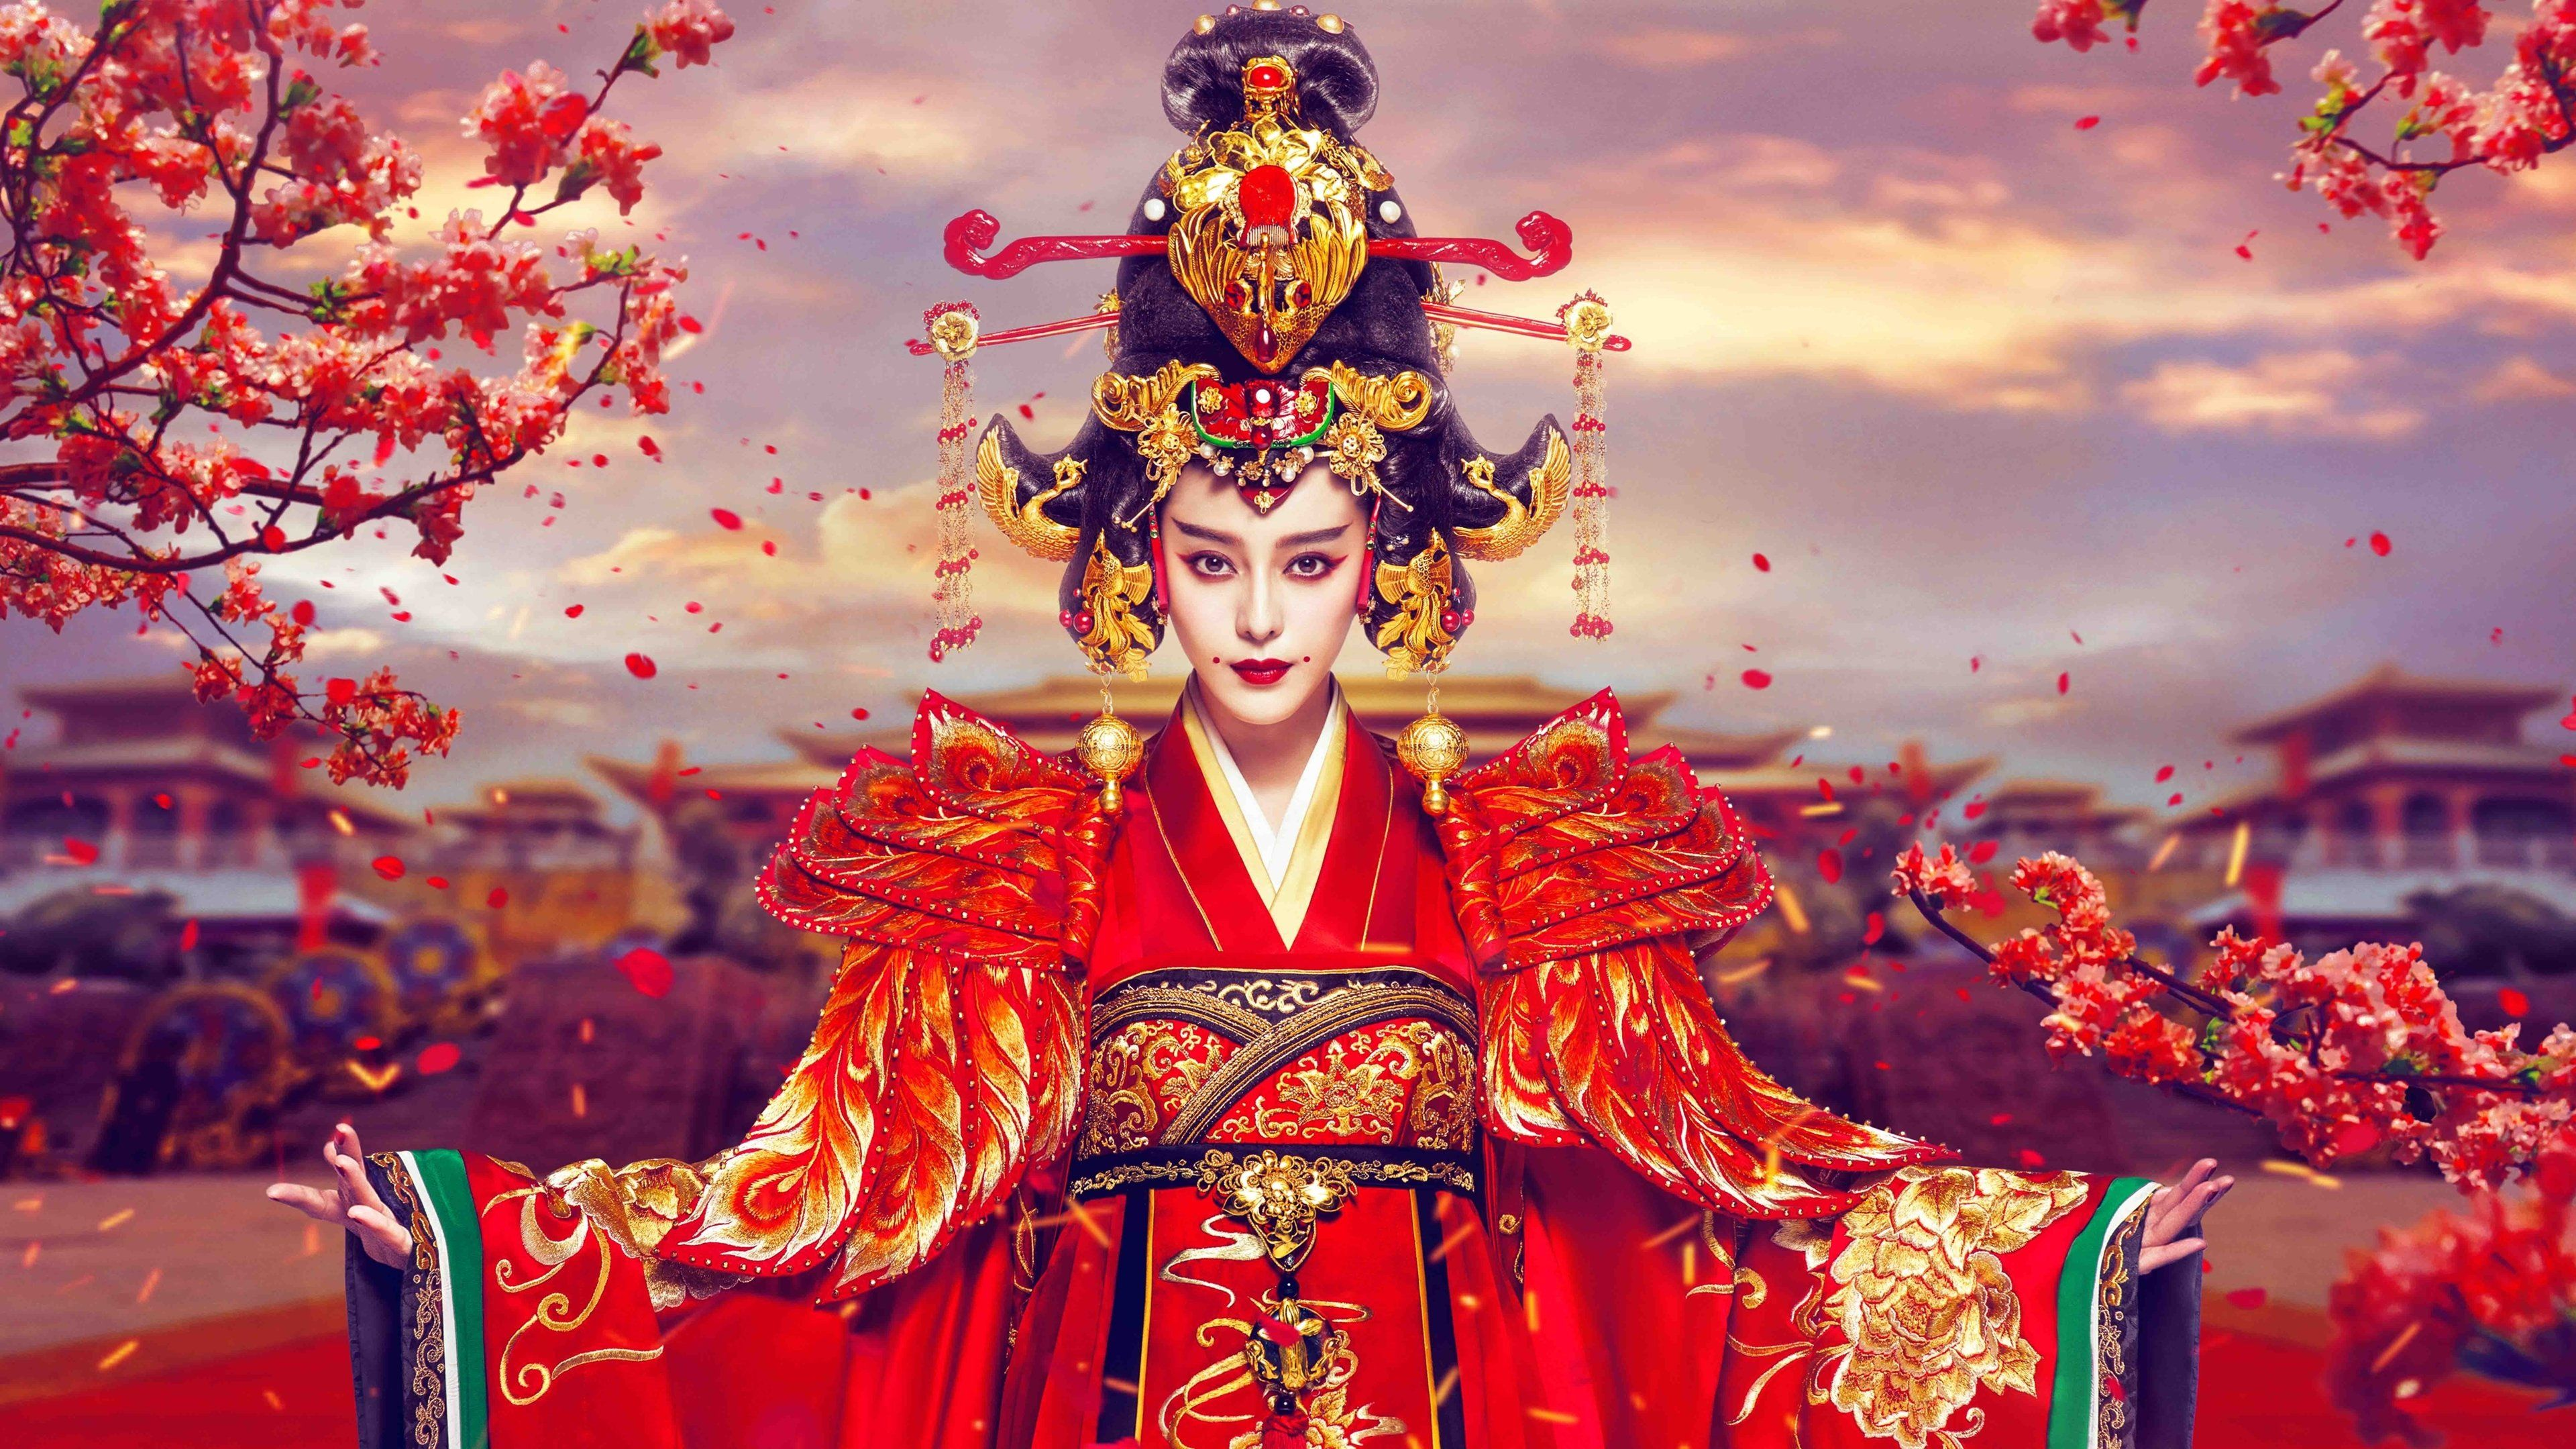 Empress of China Wallpapers   Top Empress of China 3840x2160